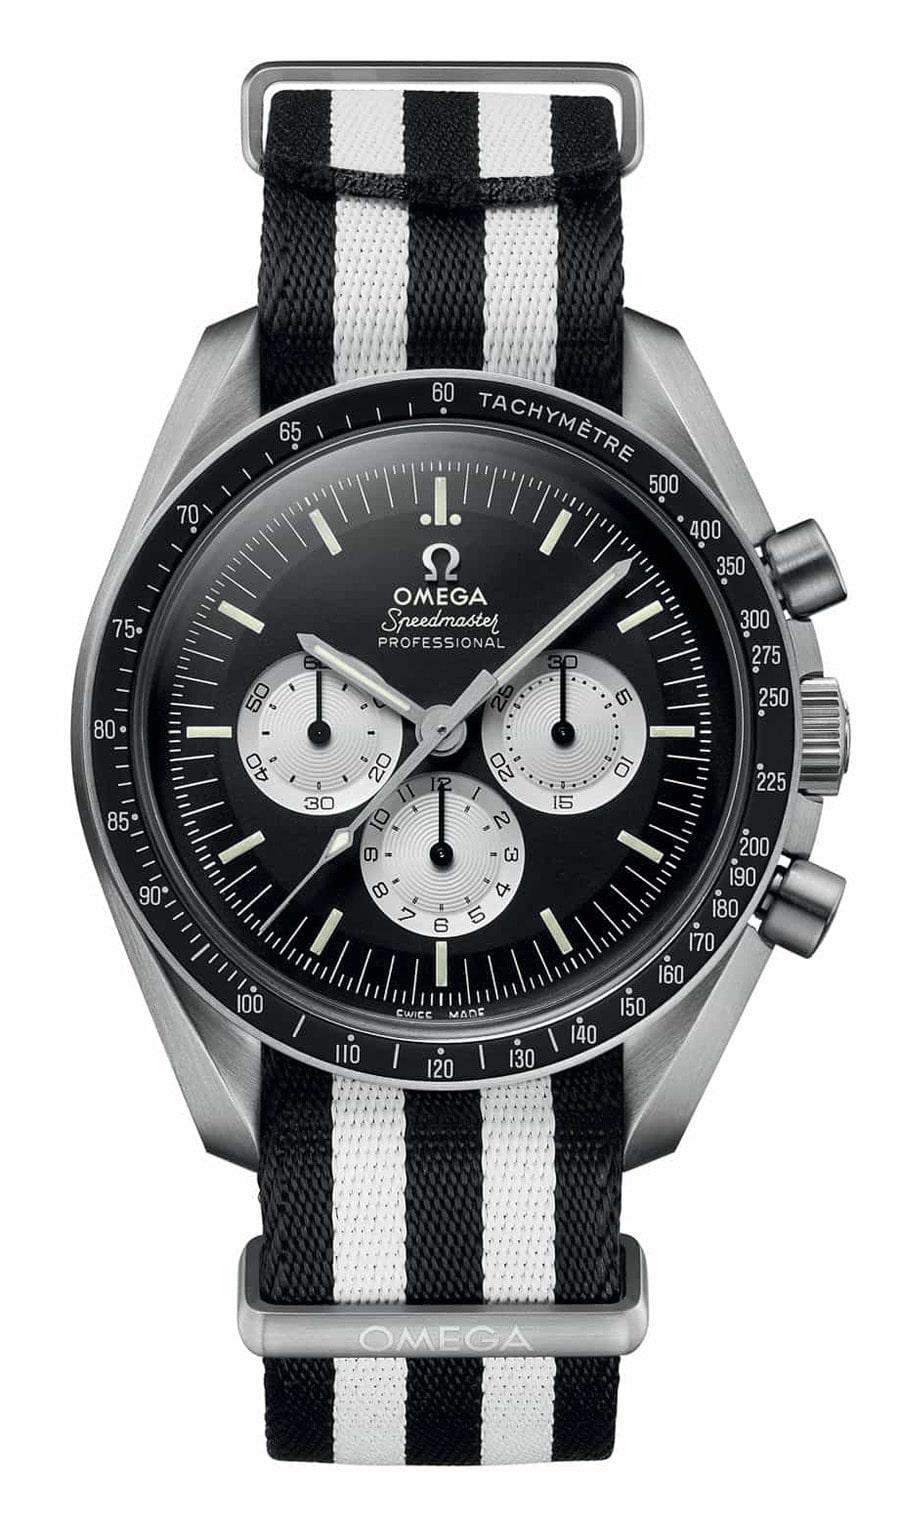 Omega Speedmaster Speedy Tuesday Edition 2017